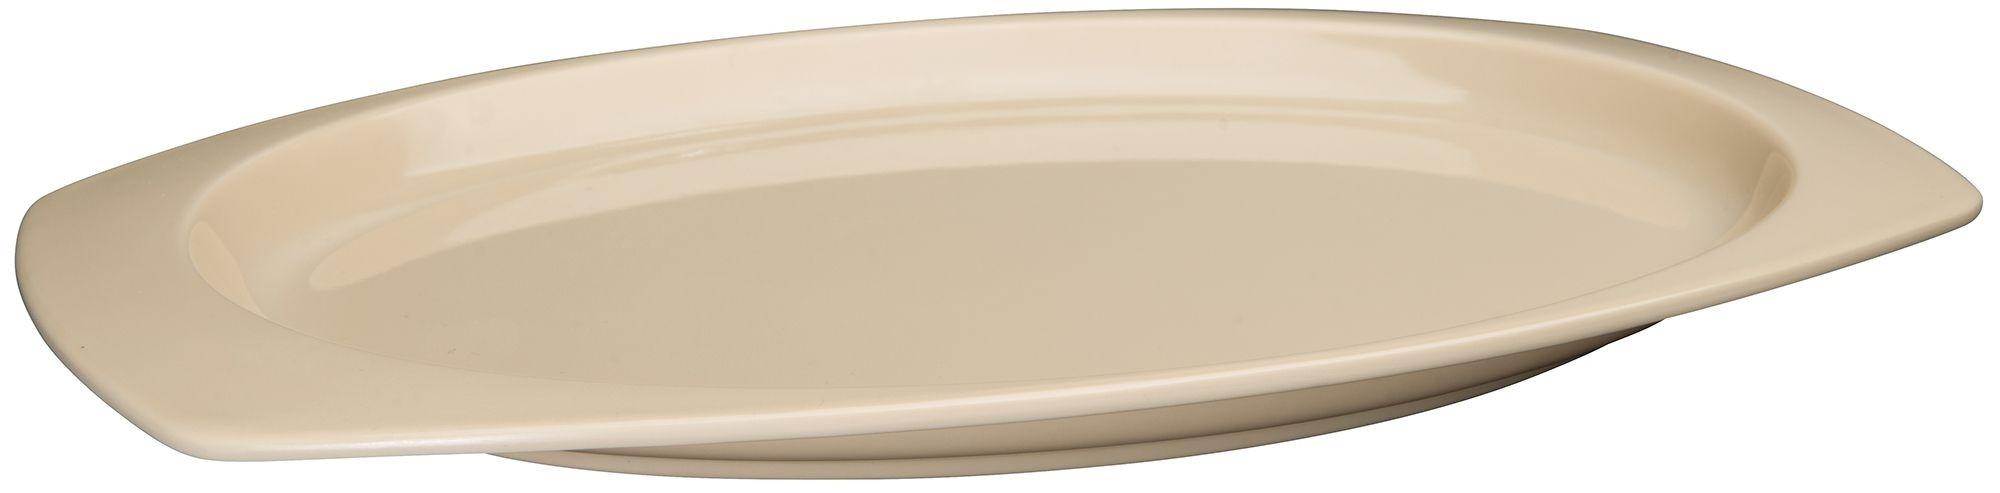 "Winco MMPT-129 Tan Melamine Rectangular Platter, 12-1/2"" x 9"""